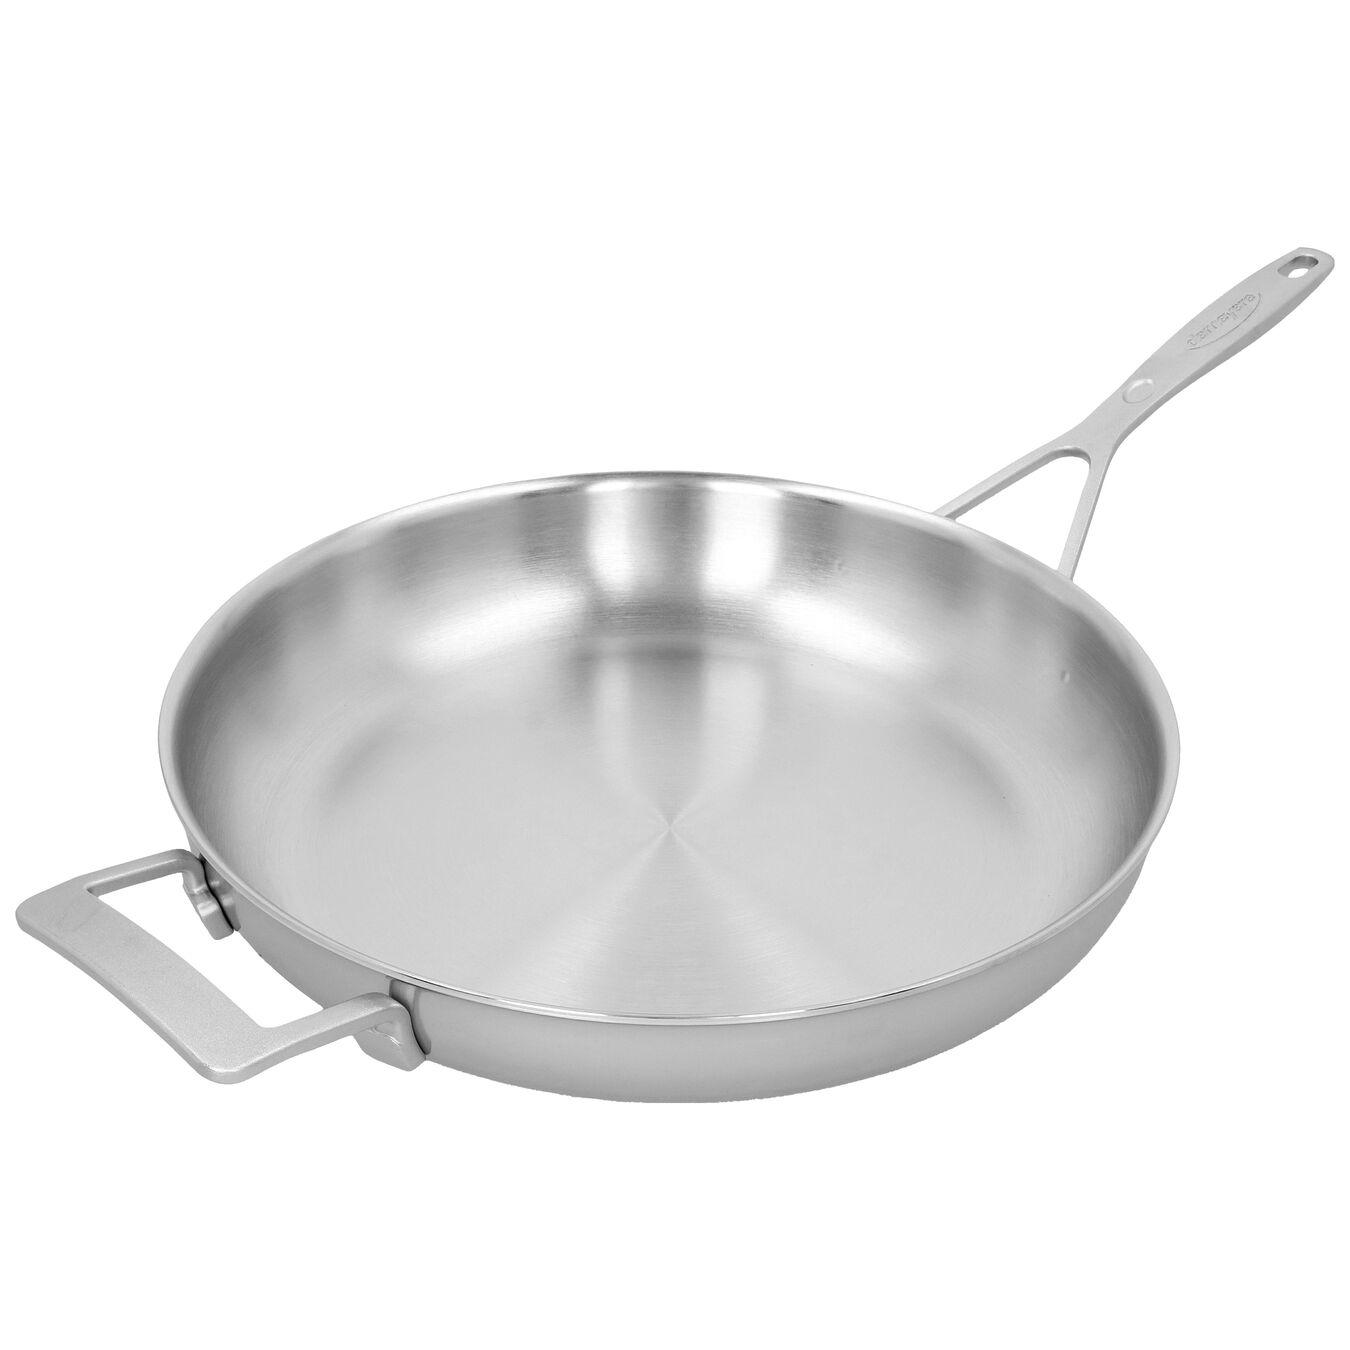 Stekpanna 32 cm, 18/10 Rostfritt stål, Silver,,large 3